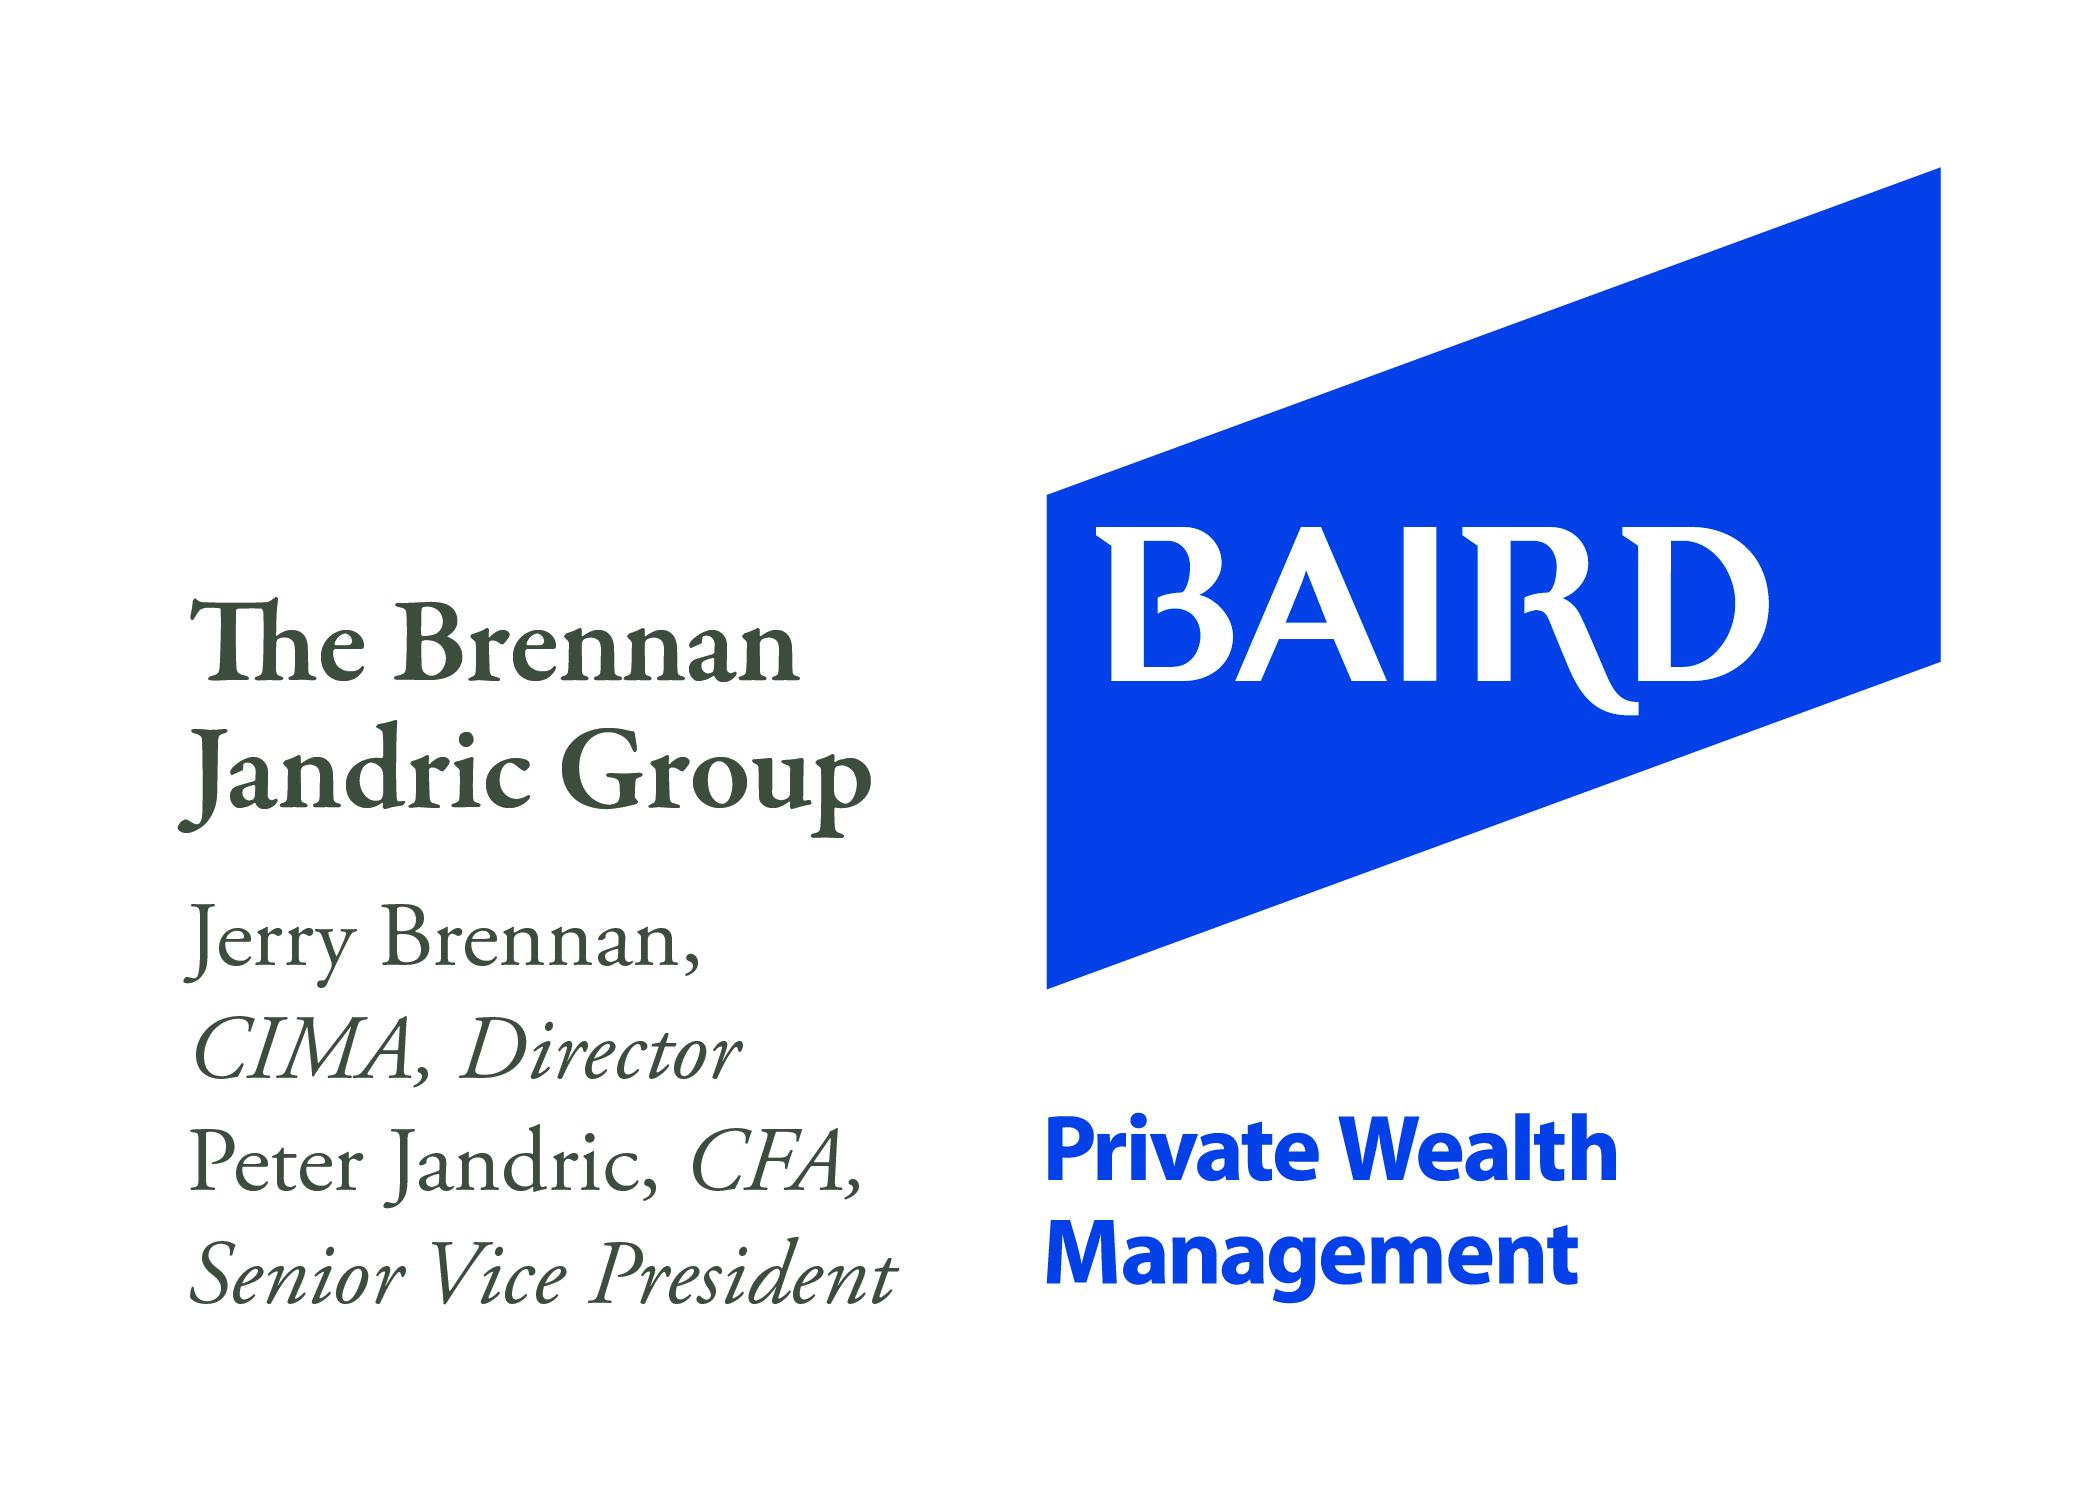 The Brennan-Jandric Group